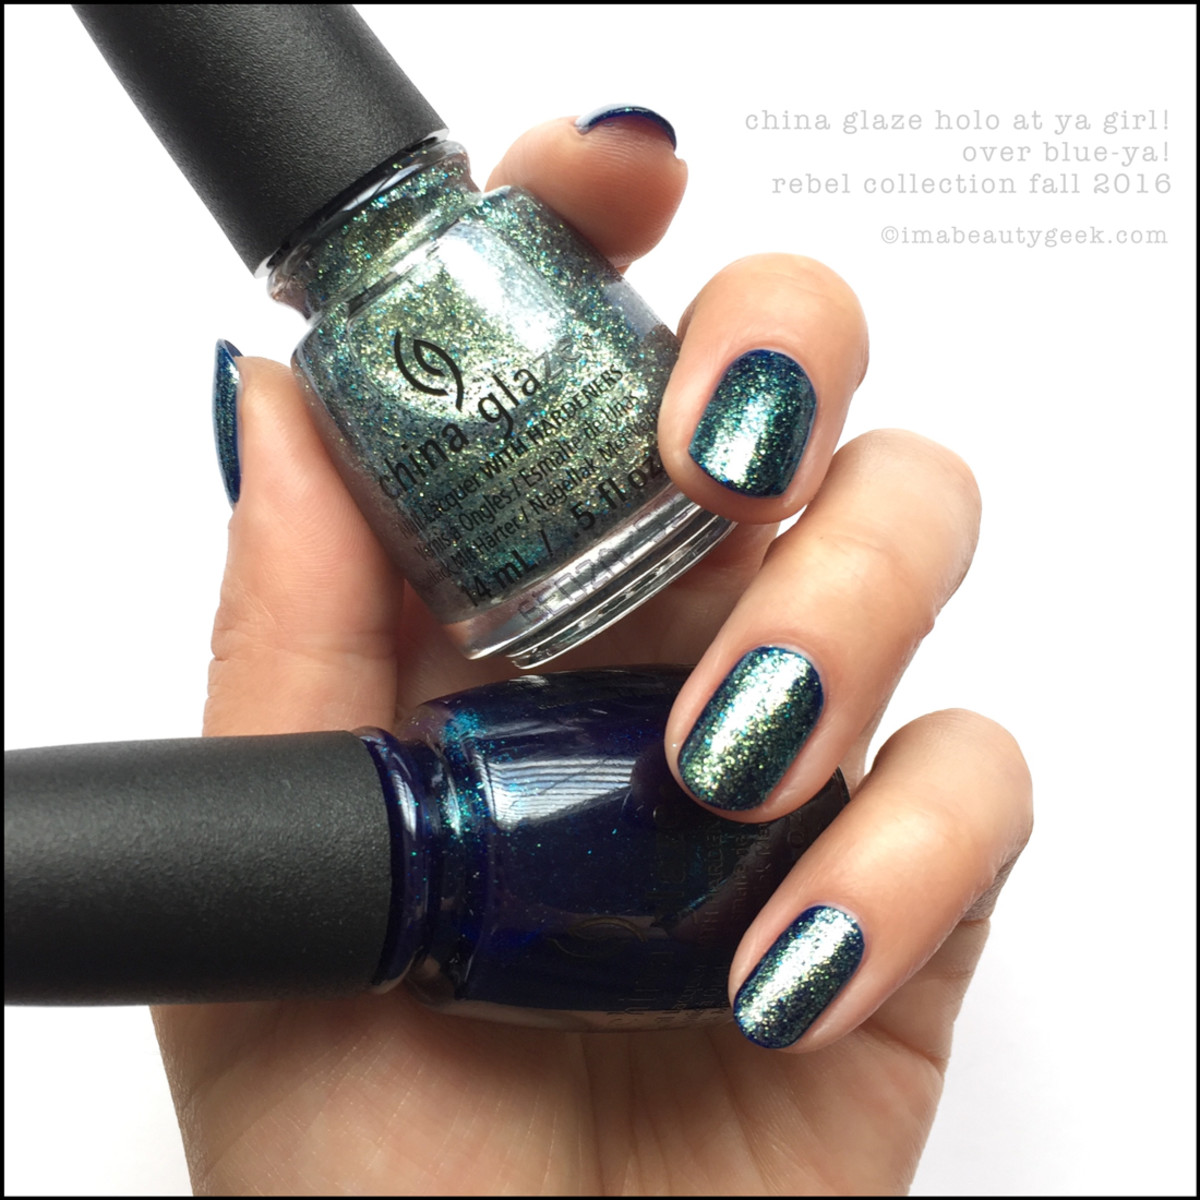 China Glaze Holo At Ya Girl over Blue Ya_China Glaze Rebel Collection Swatches 2016